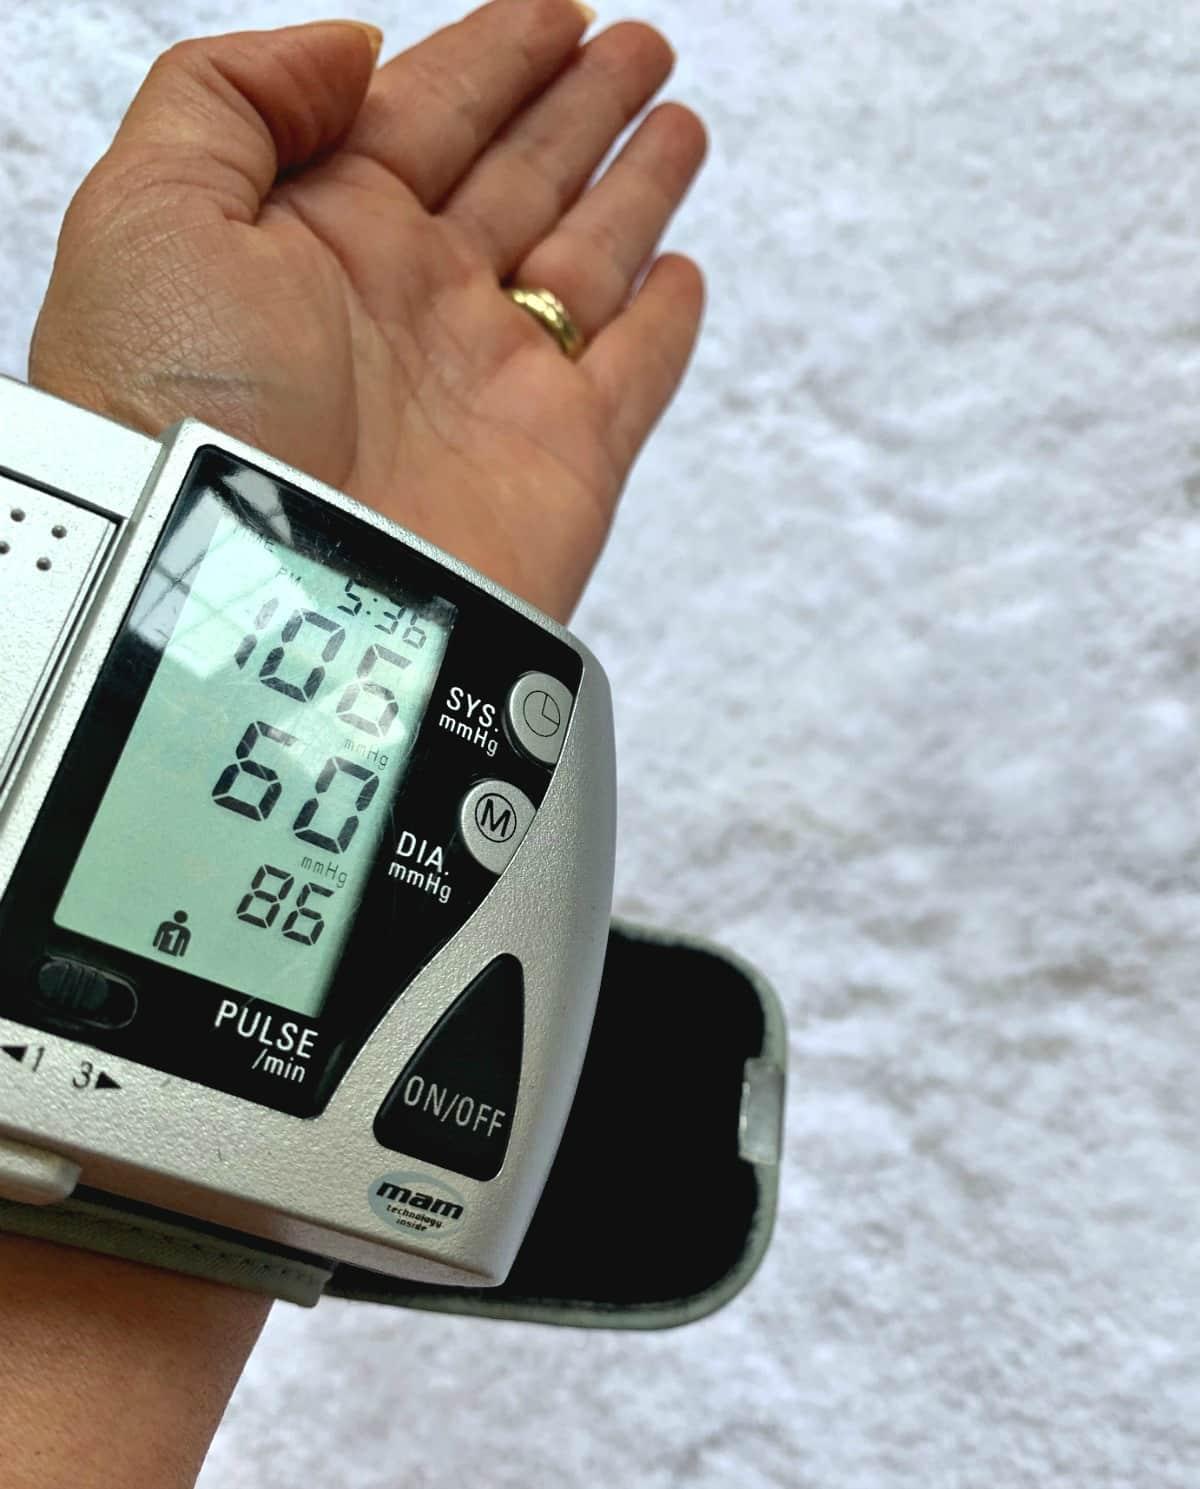 Monitor blood pressure St Joseph Aspirin heart healthy